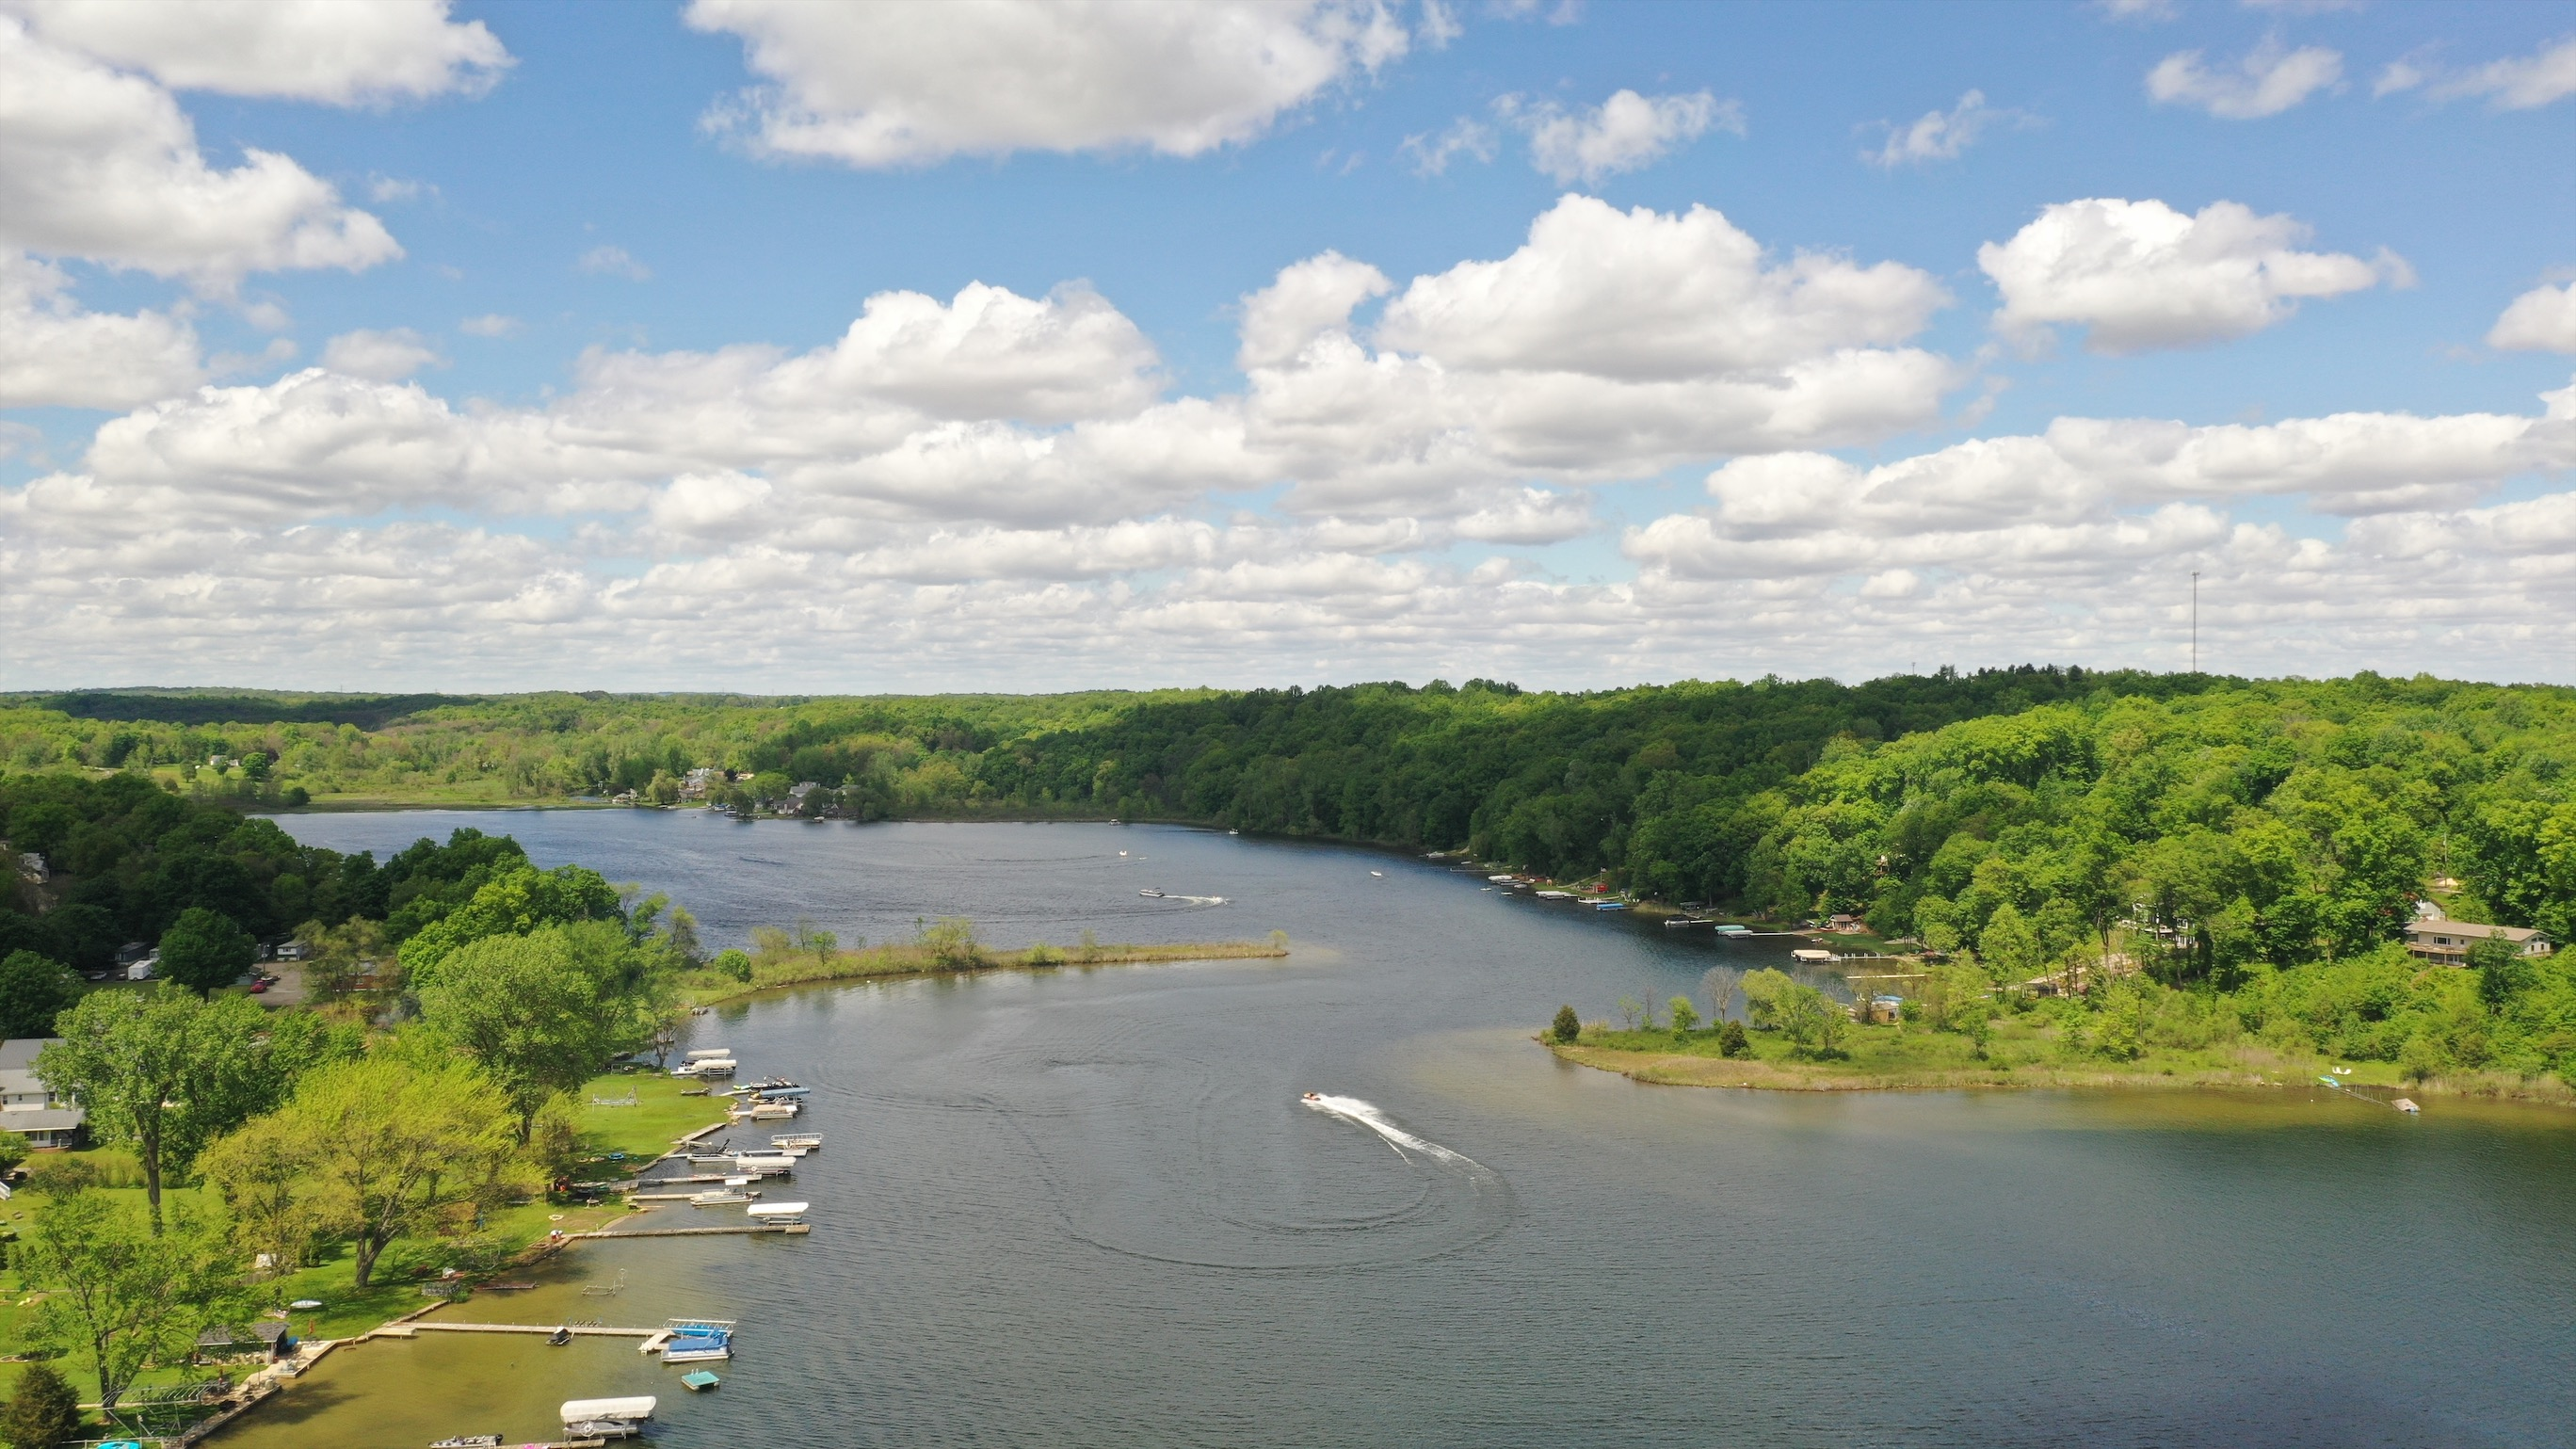 200 foot Lake Drone Shot